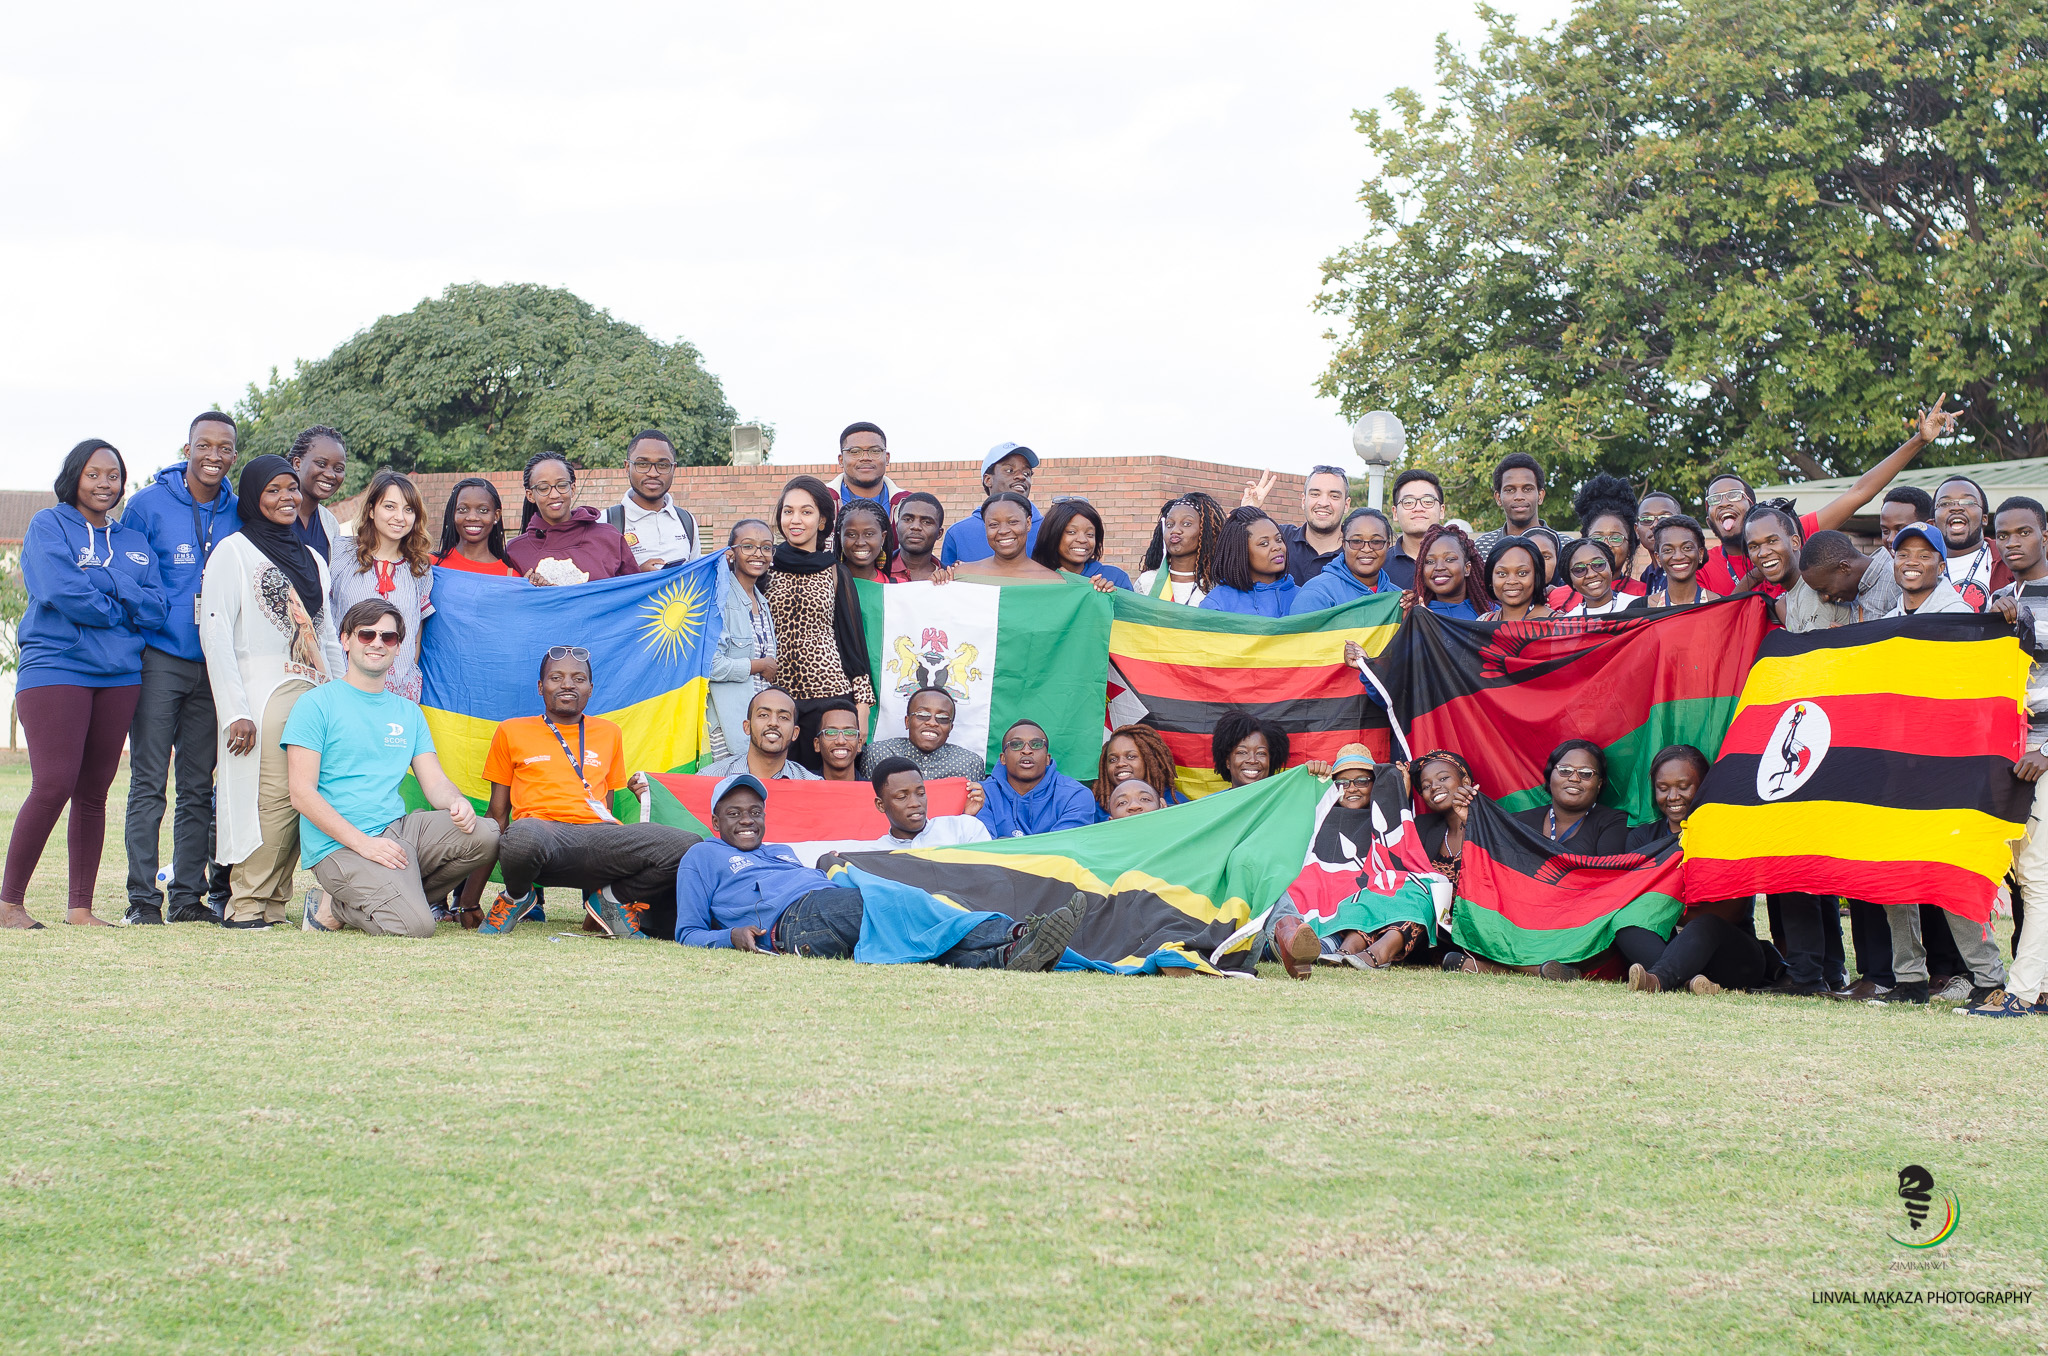 African Regional Meeting 2018 – International Federation of Medical Students' Associations (IFMSA)